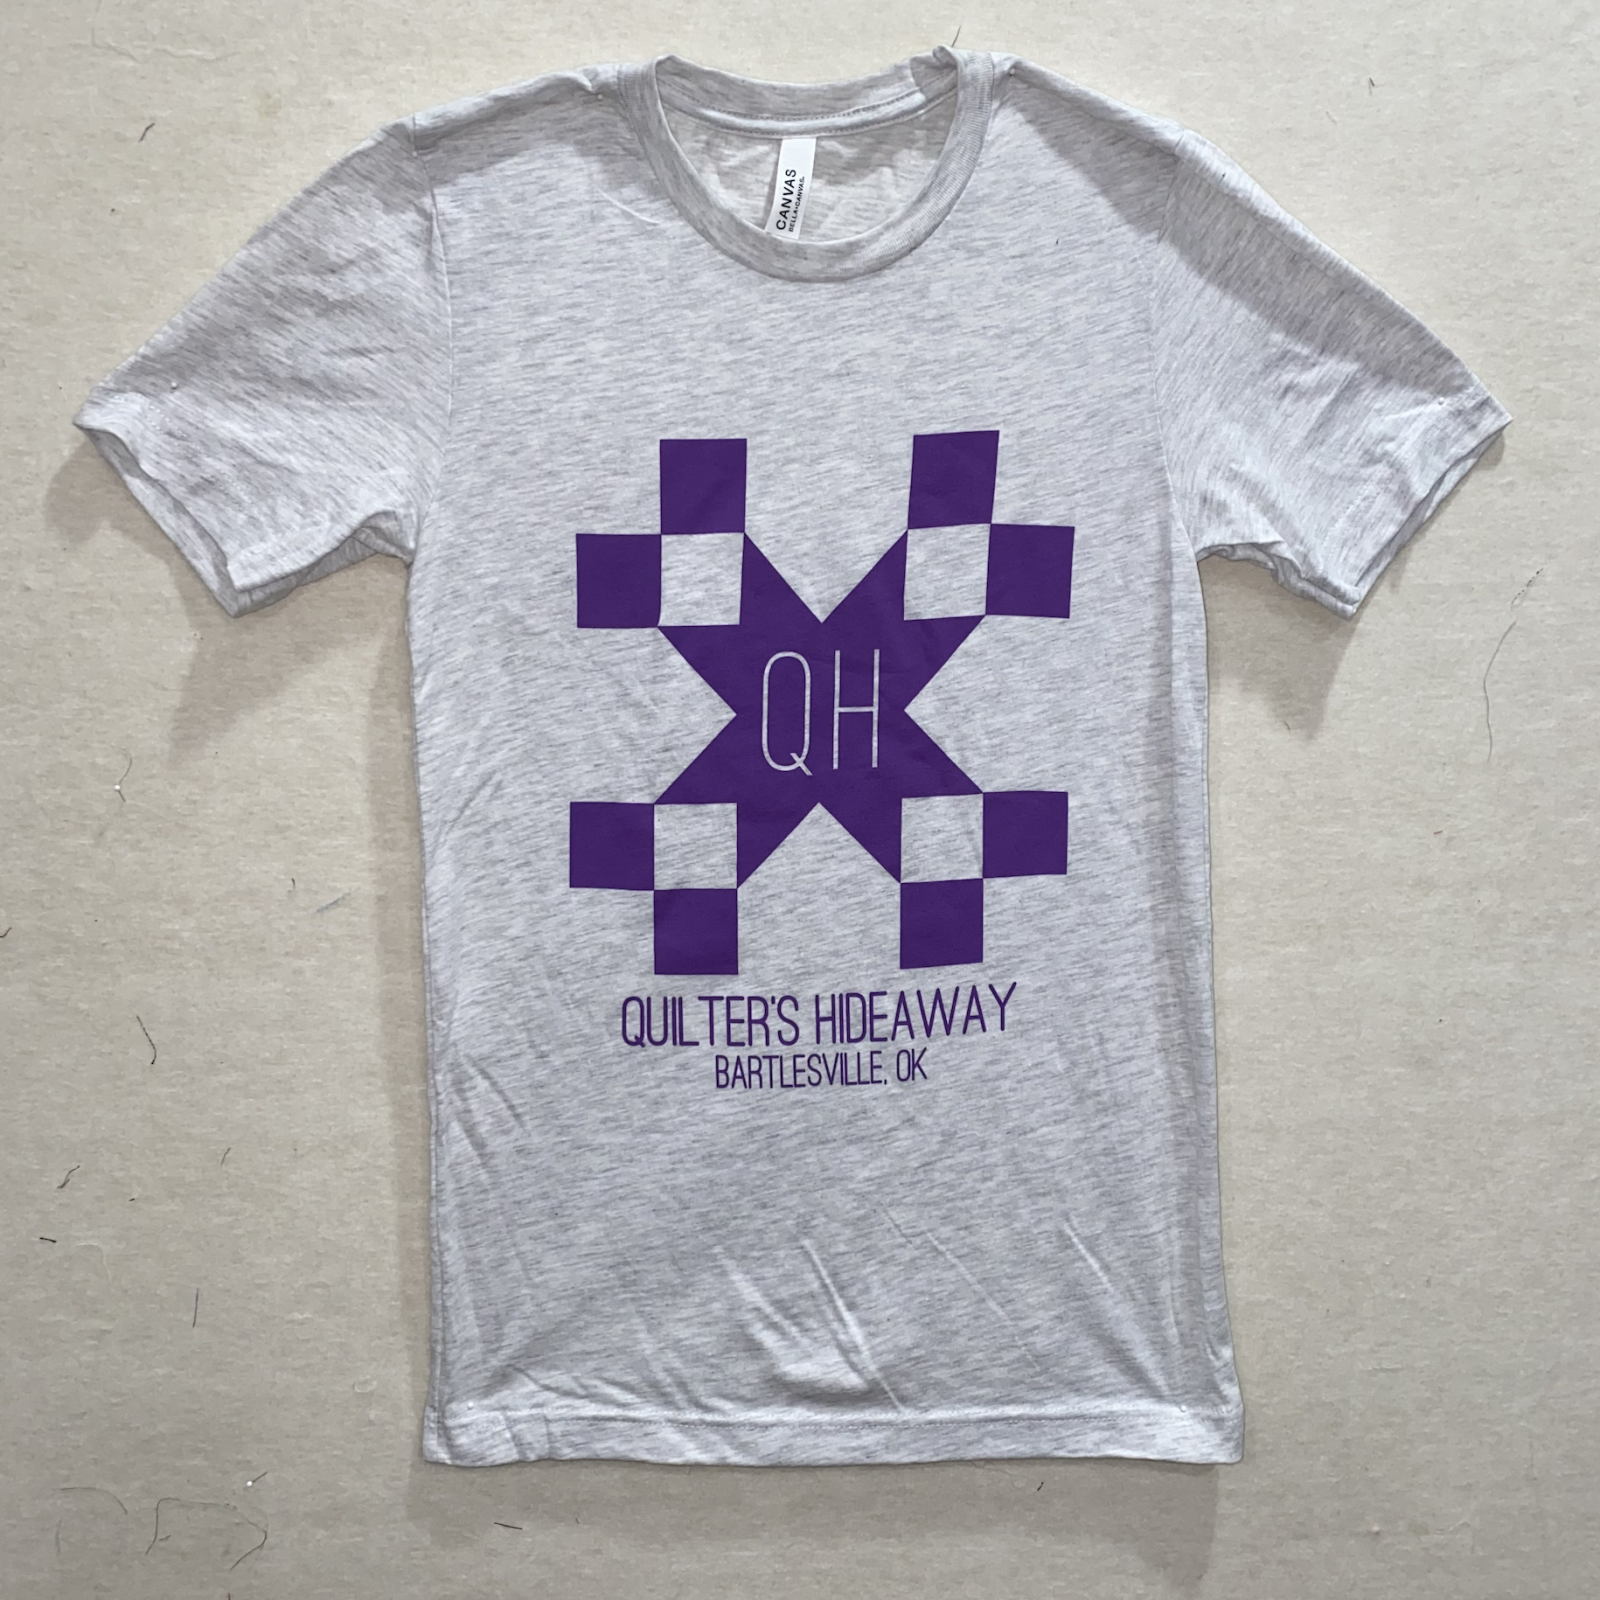 QH Ash Short Sleeve T Shirt - Small